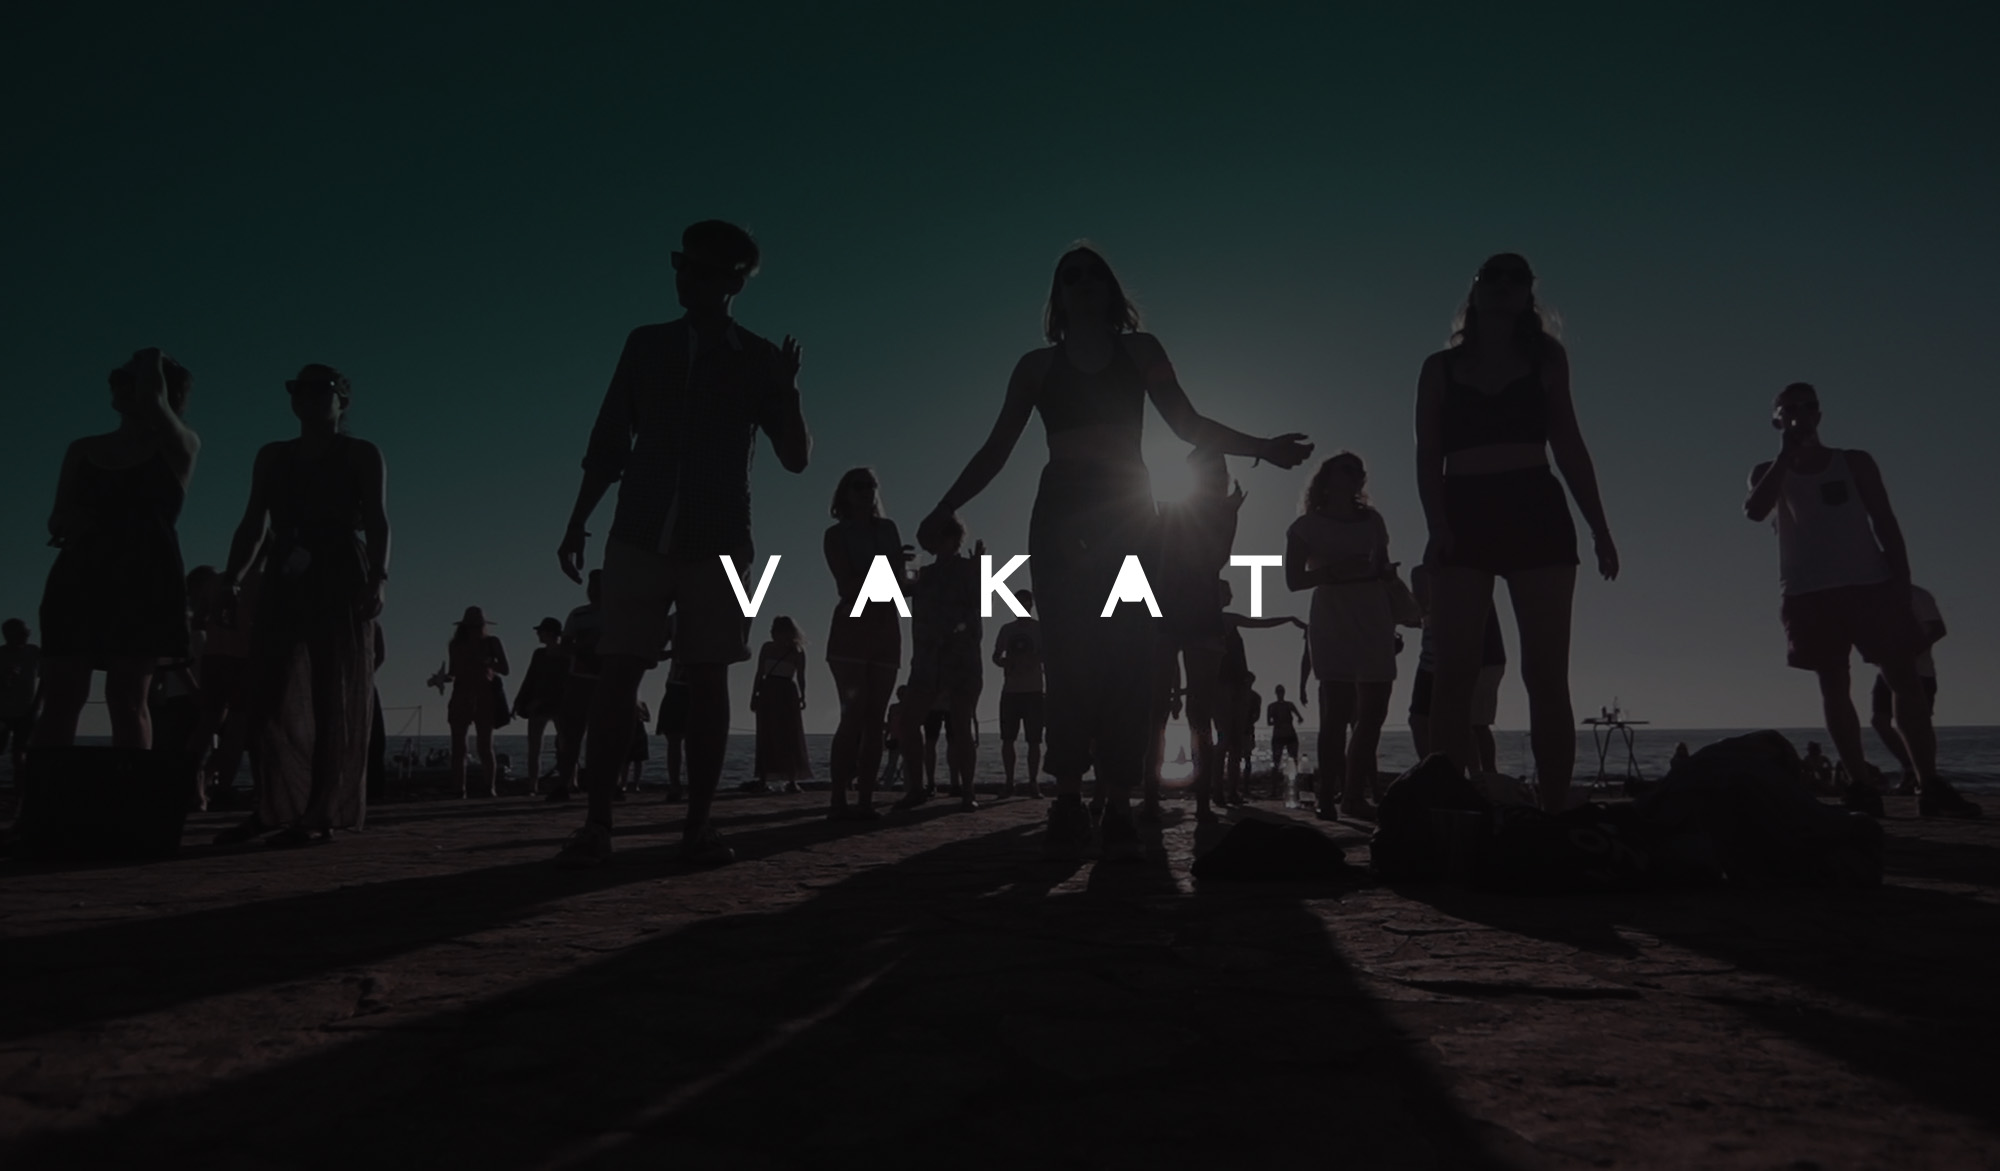 Info Vakat Media Film Photography Design Graphic Johannes Jelinek